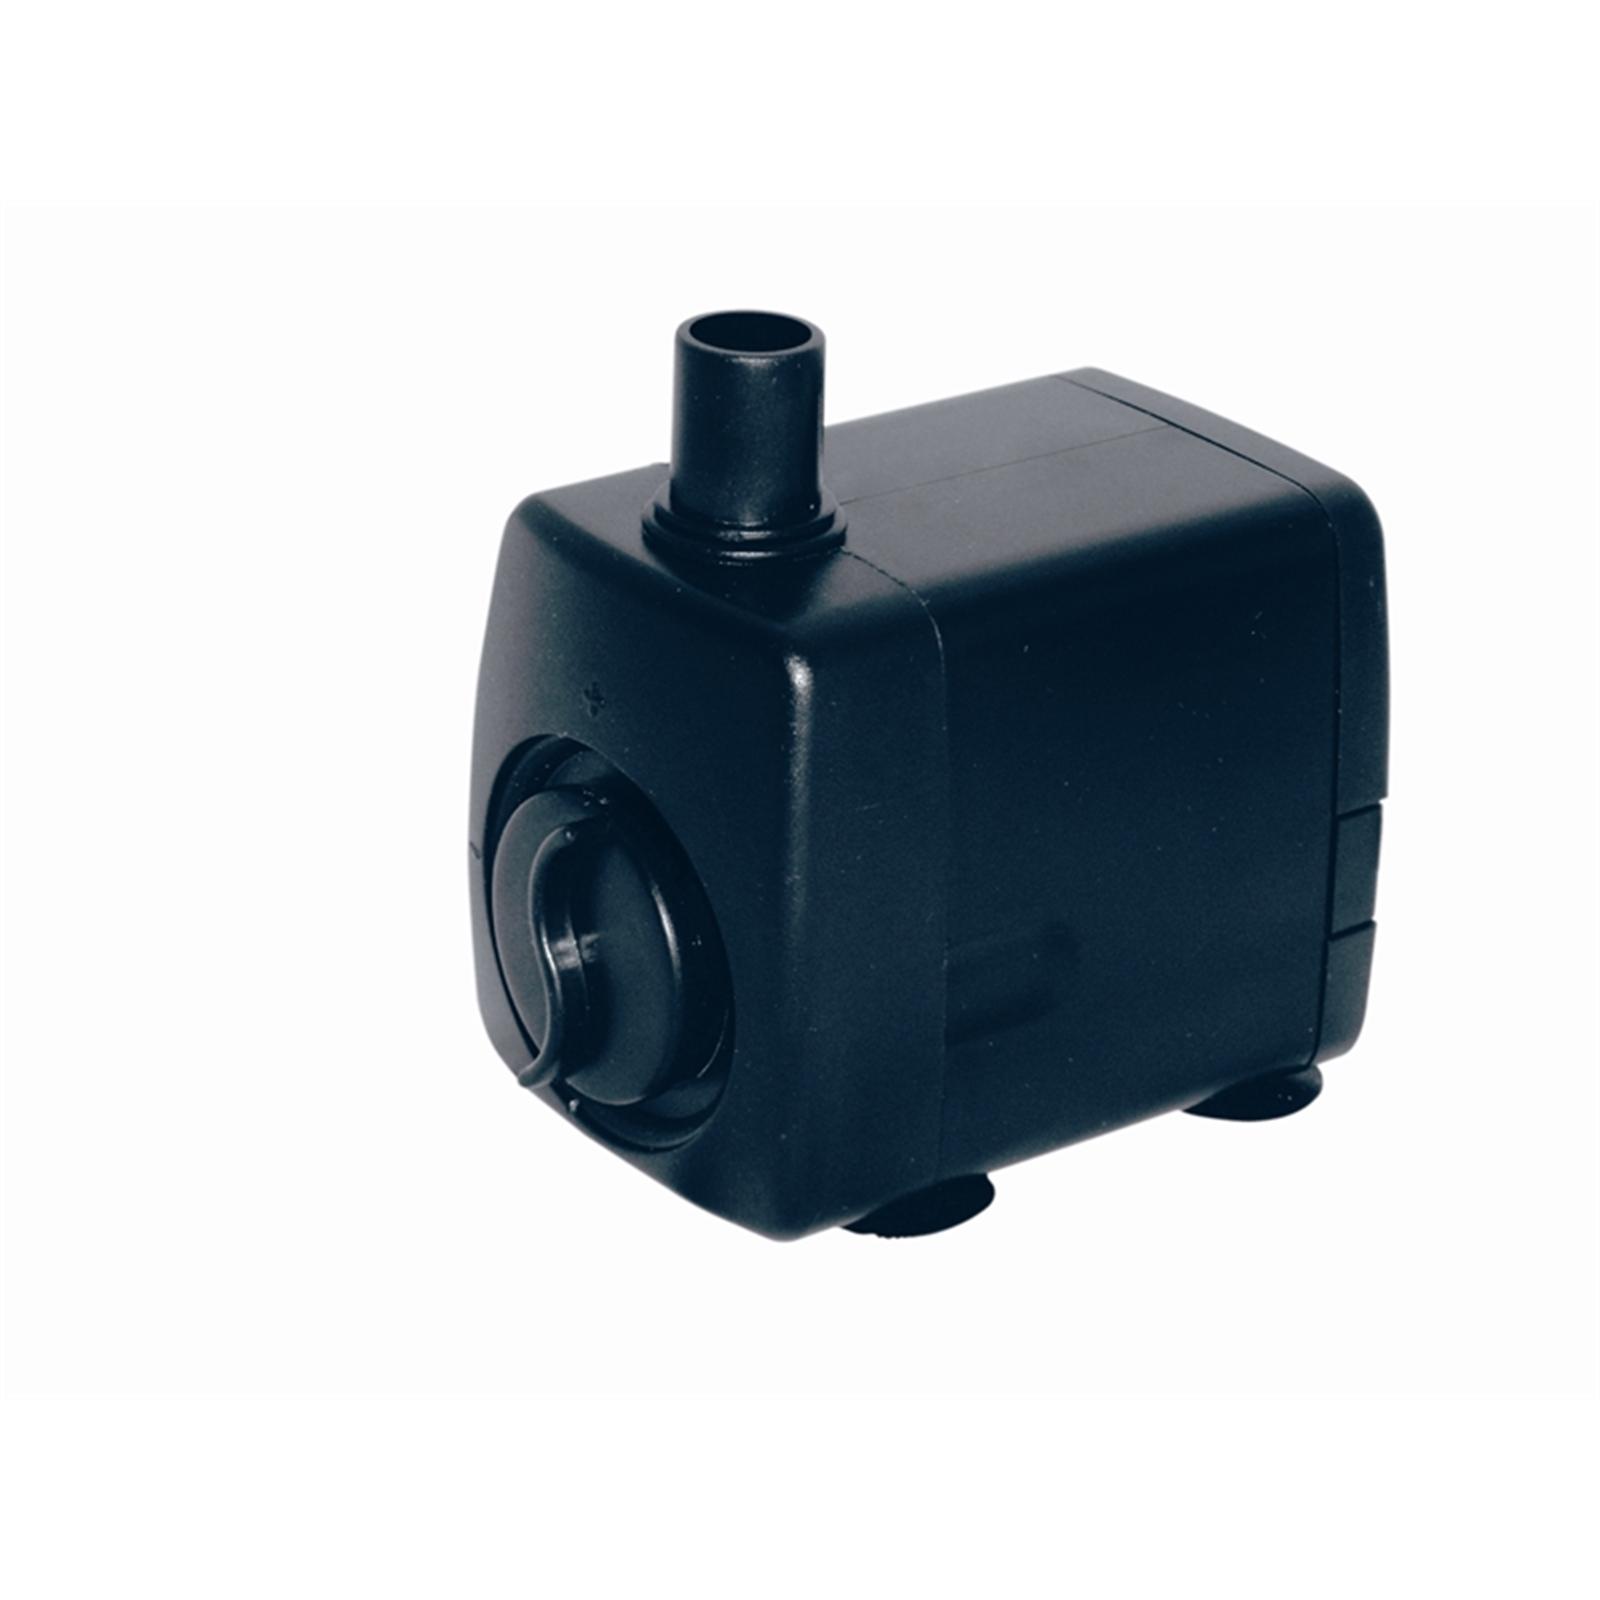 Aquapro Low Voltage Water Feature Pump